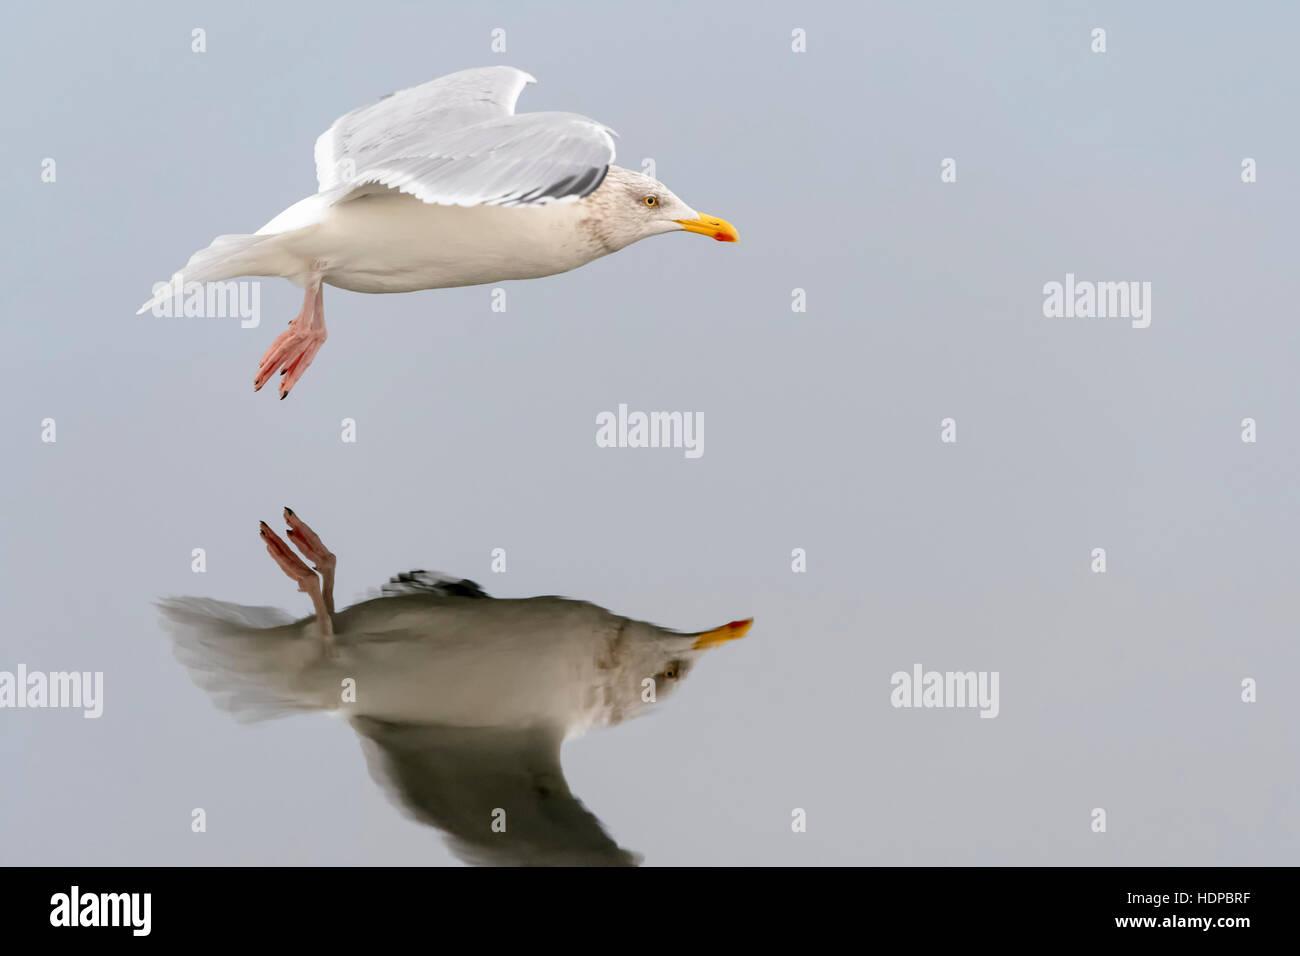 Aringa gabbiano (Larus argentatus), volare con la riflessione, Norvegia, Flatanger, Lauvsnes Immagini Stock